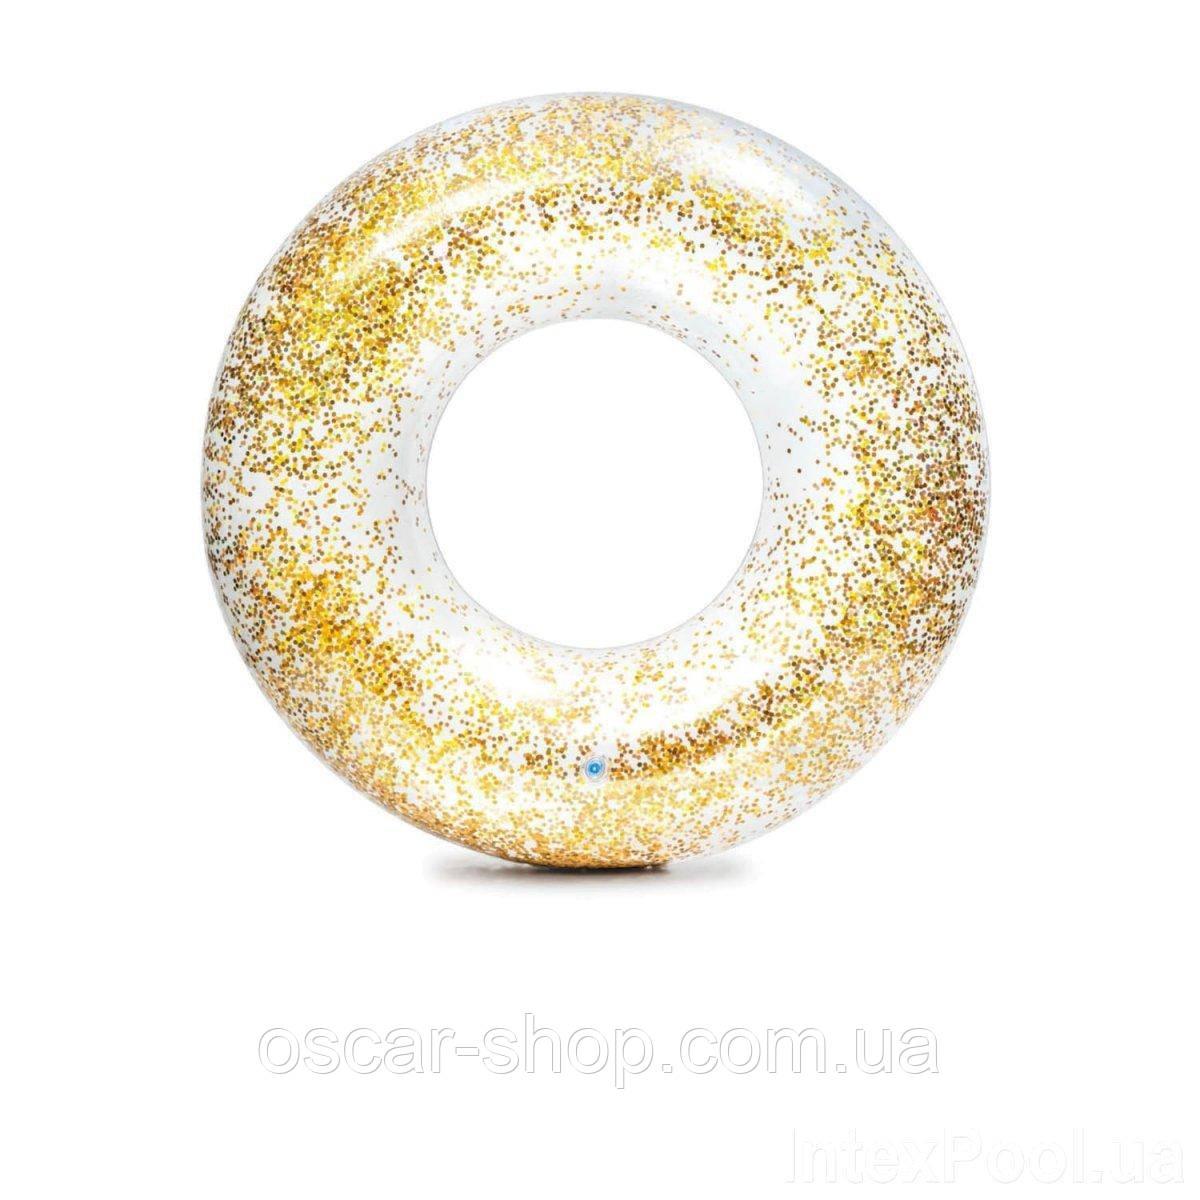 Intex надувний круг «Золотий блиск», 119 см, золотий